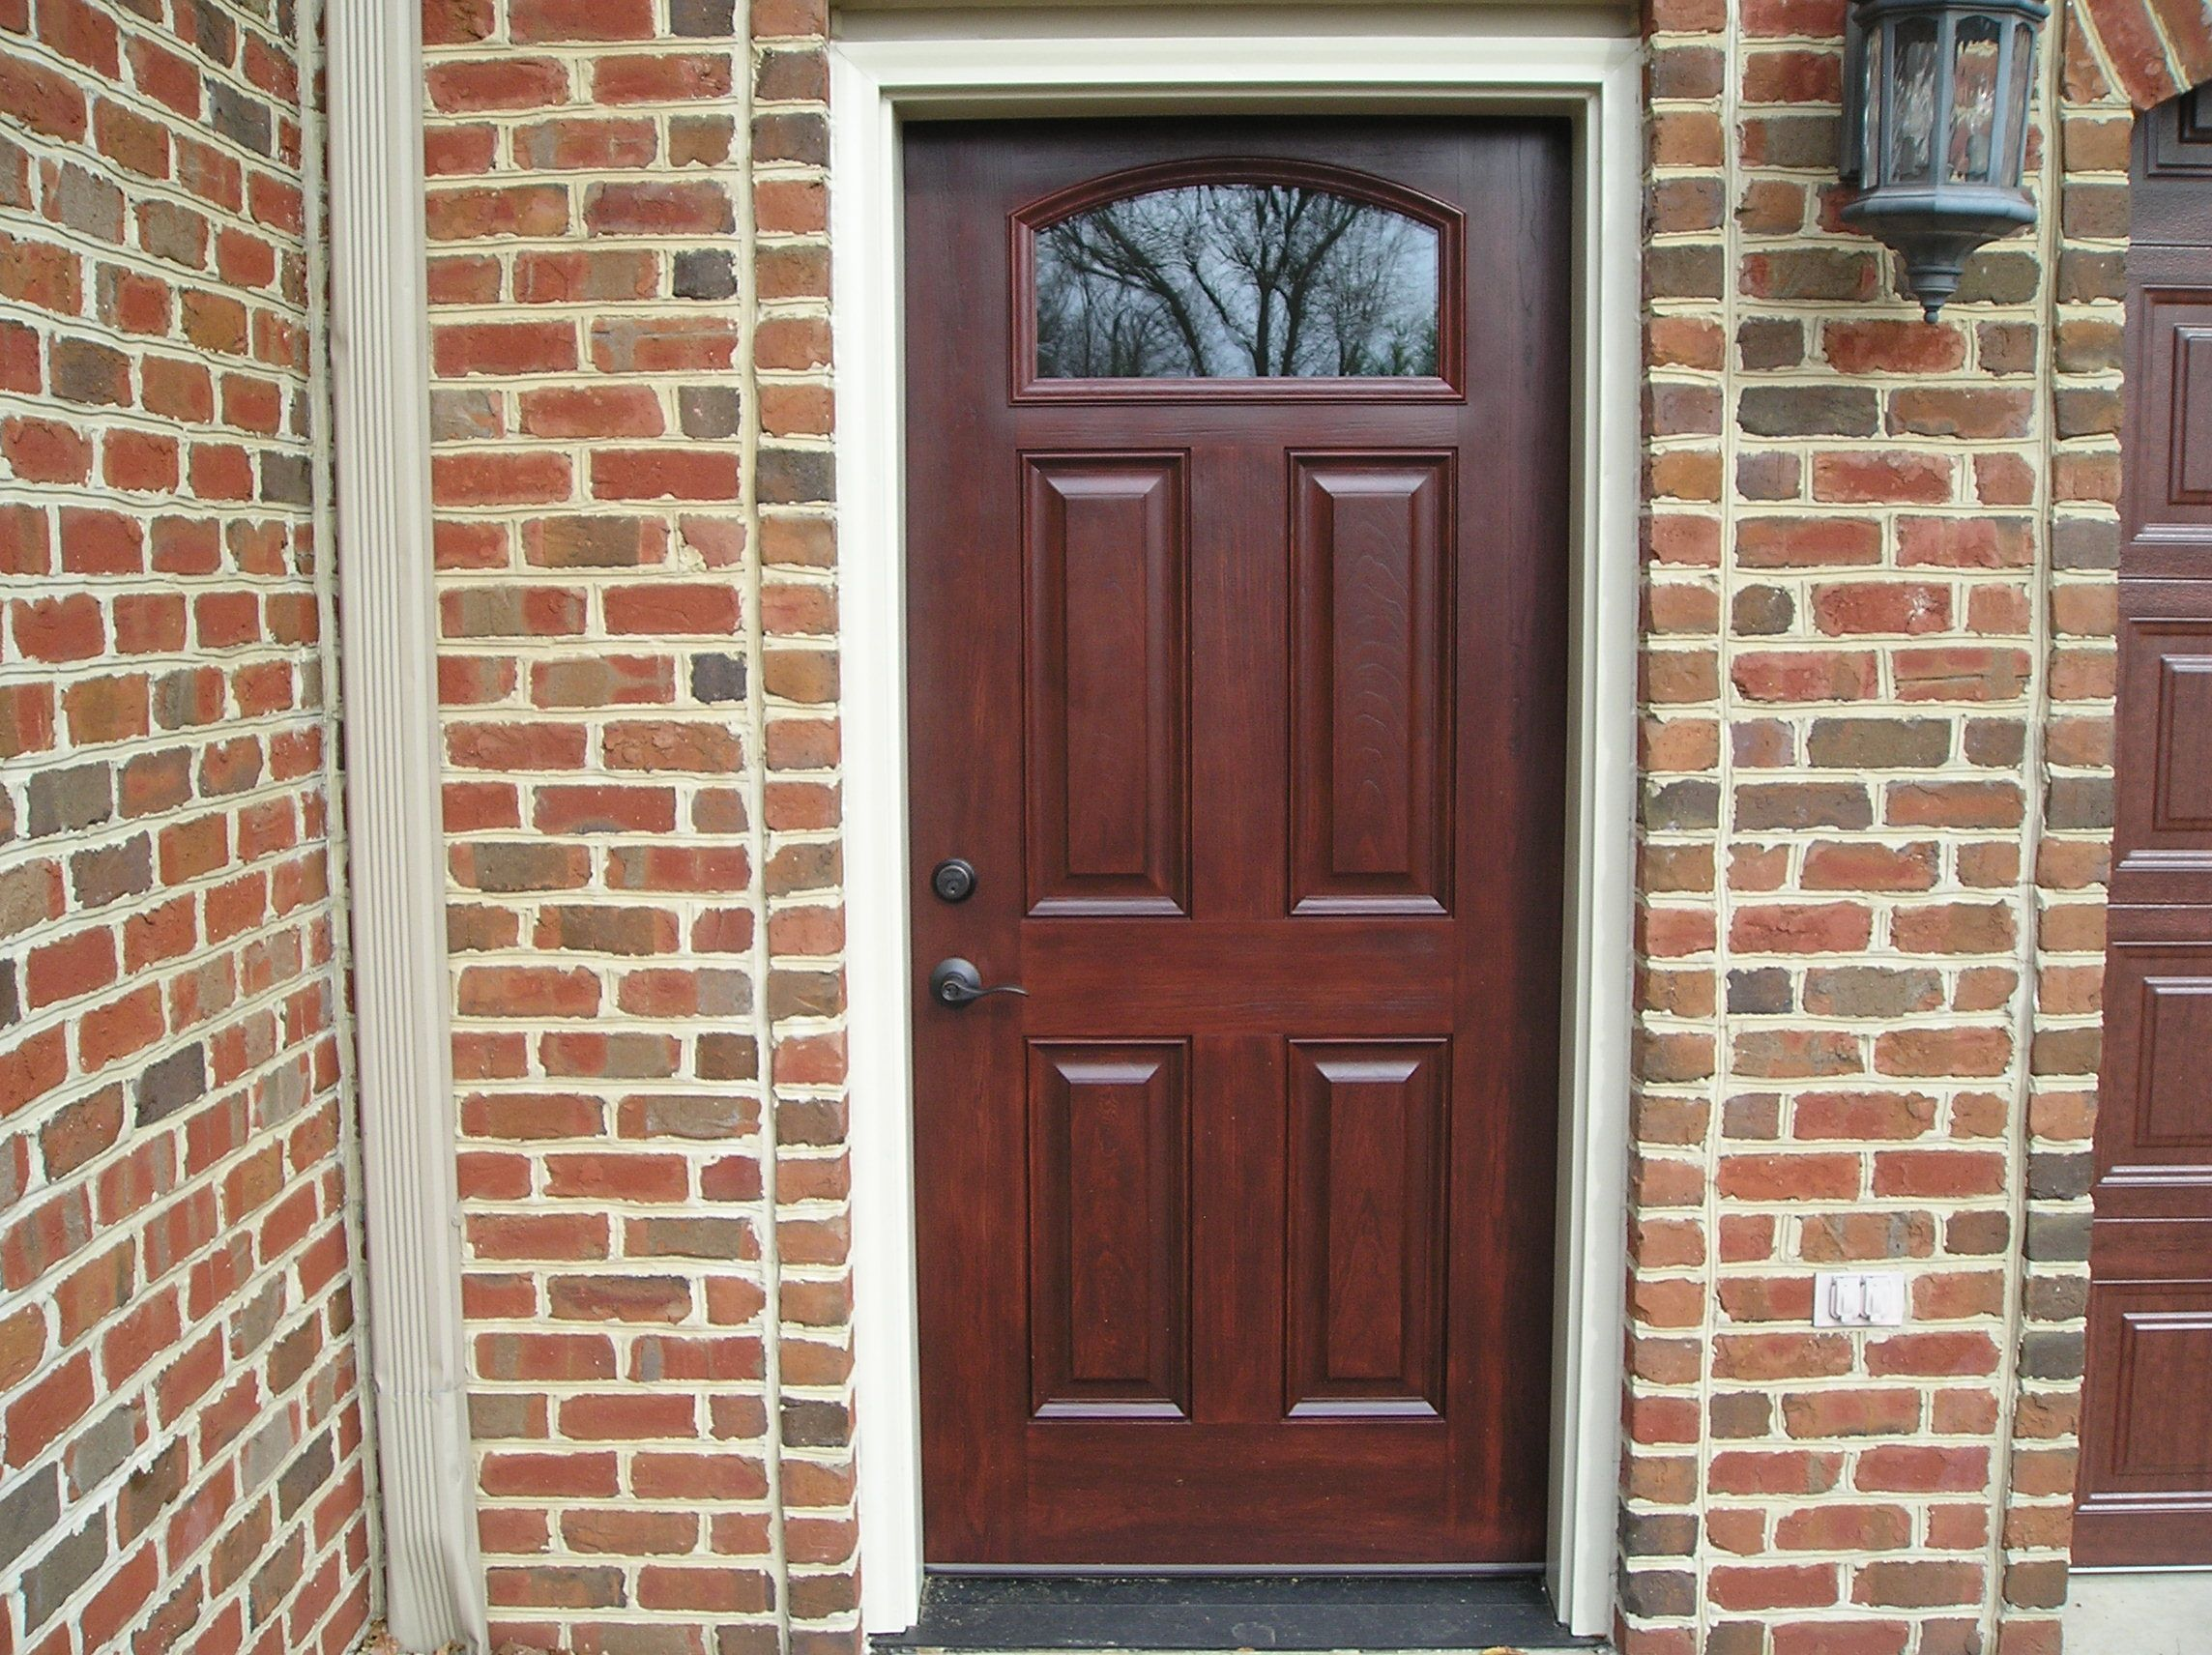 Provia signet fiberglass entry door in cherry provia for What is provia